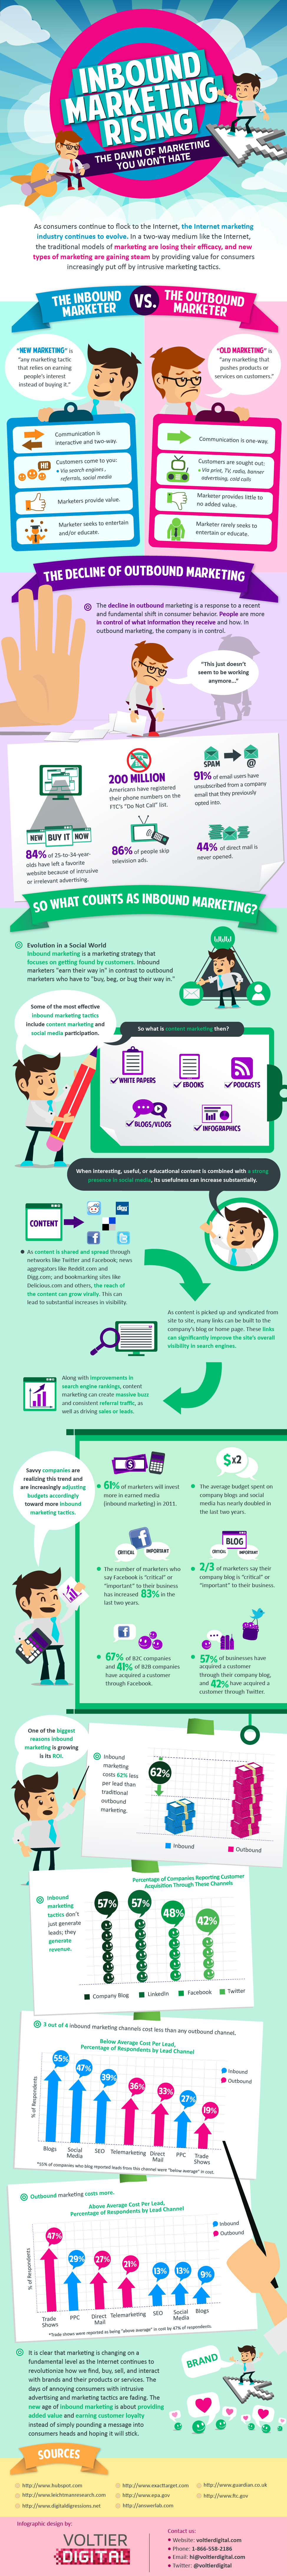 marketing infographic inbound marketing rising